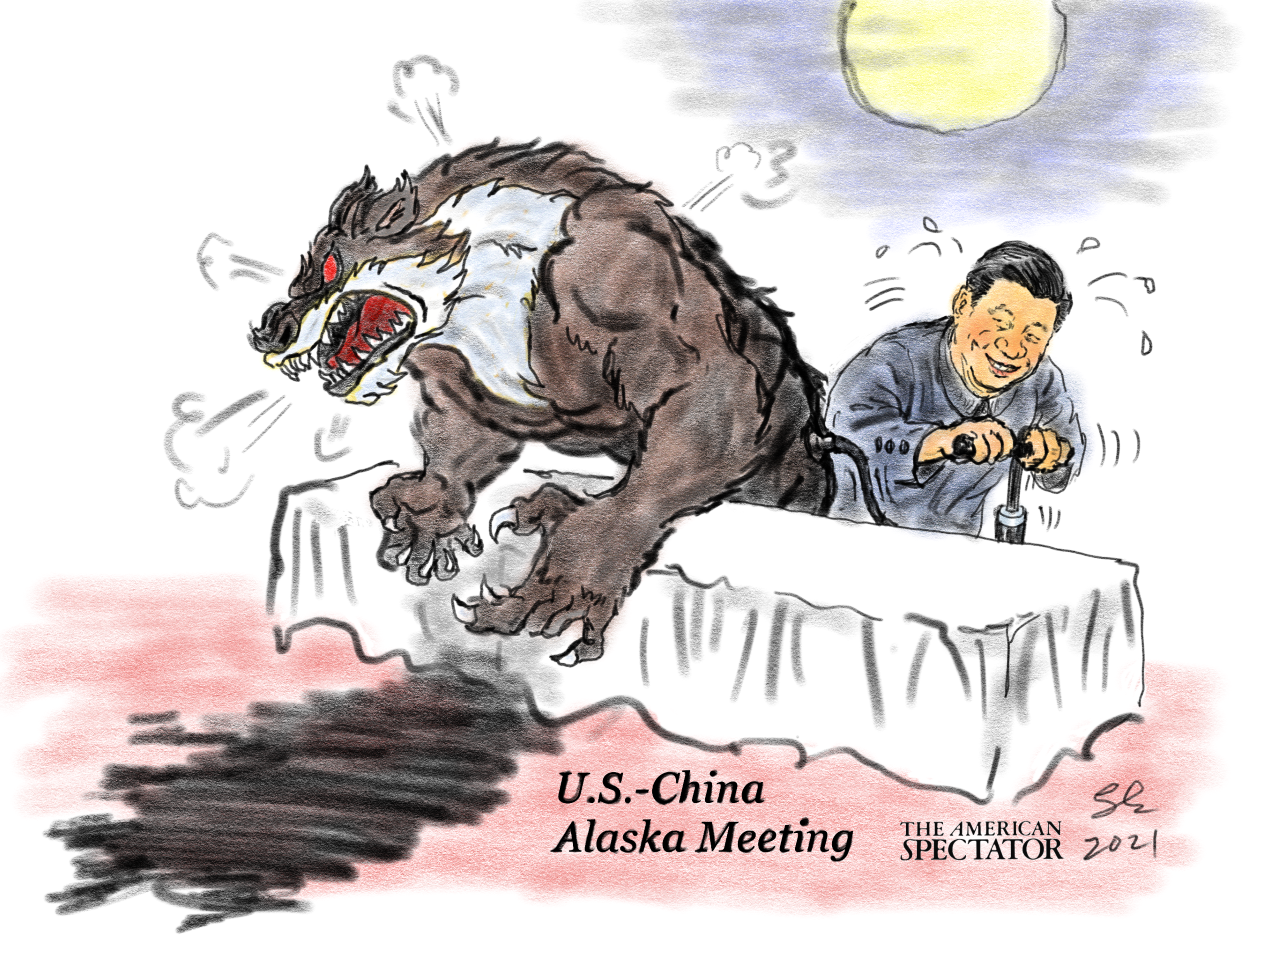 """Xi's Wolf Warrior Diplomats,"" editorial cartoon by Shaomin Li forThe American Spectator, spectator.org, March 22, 2021"